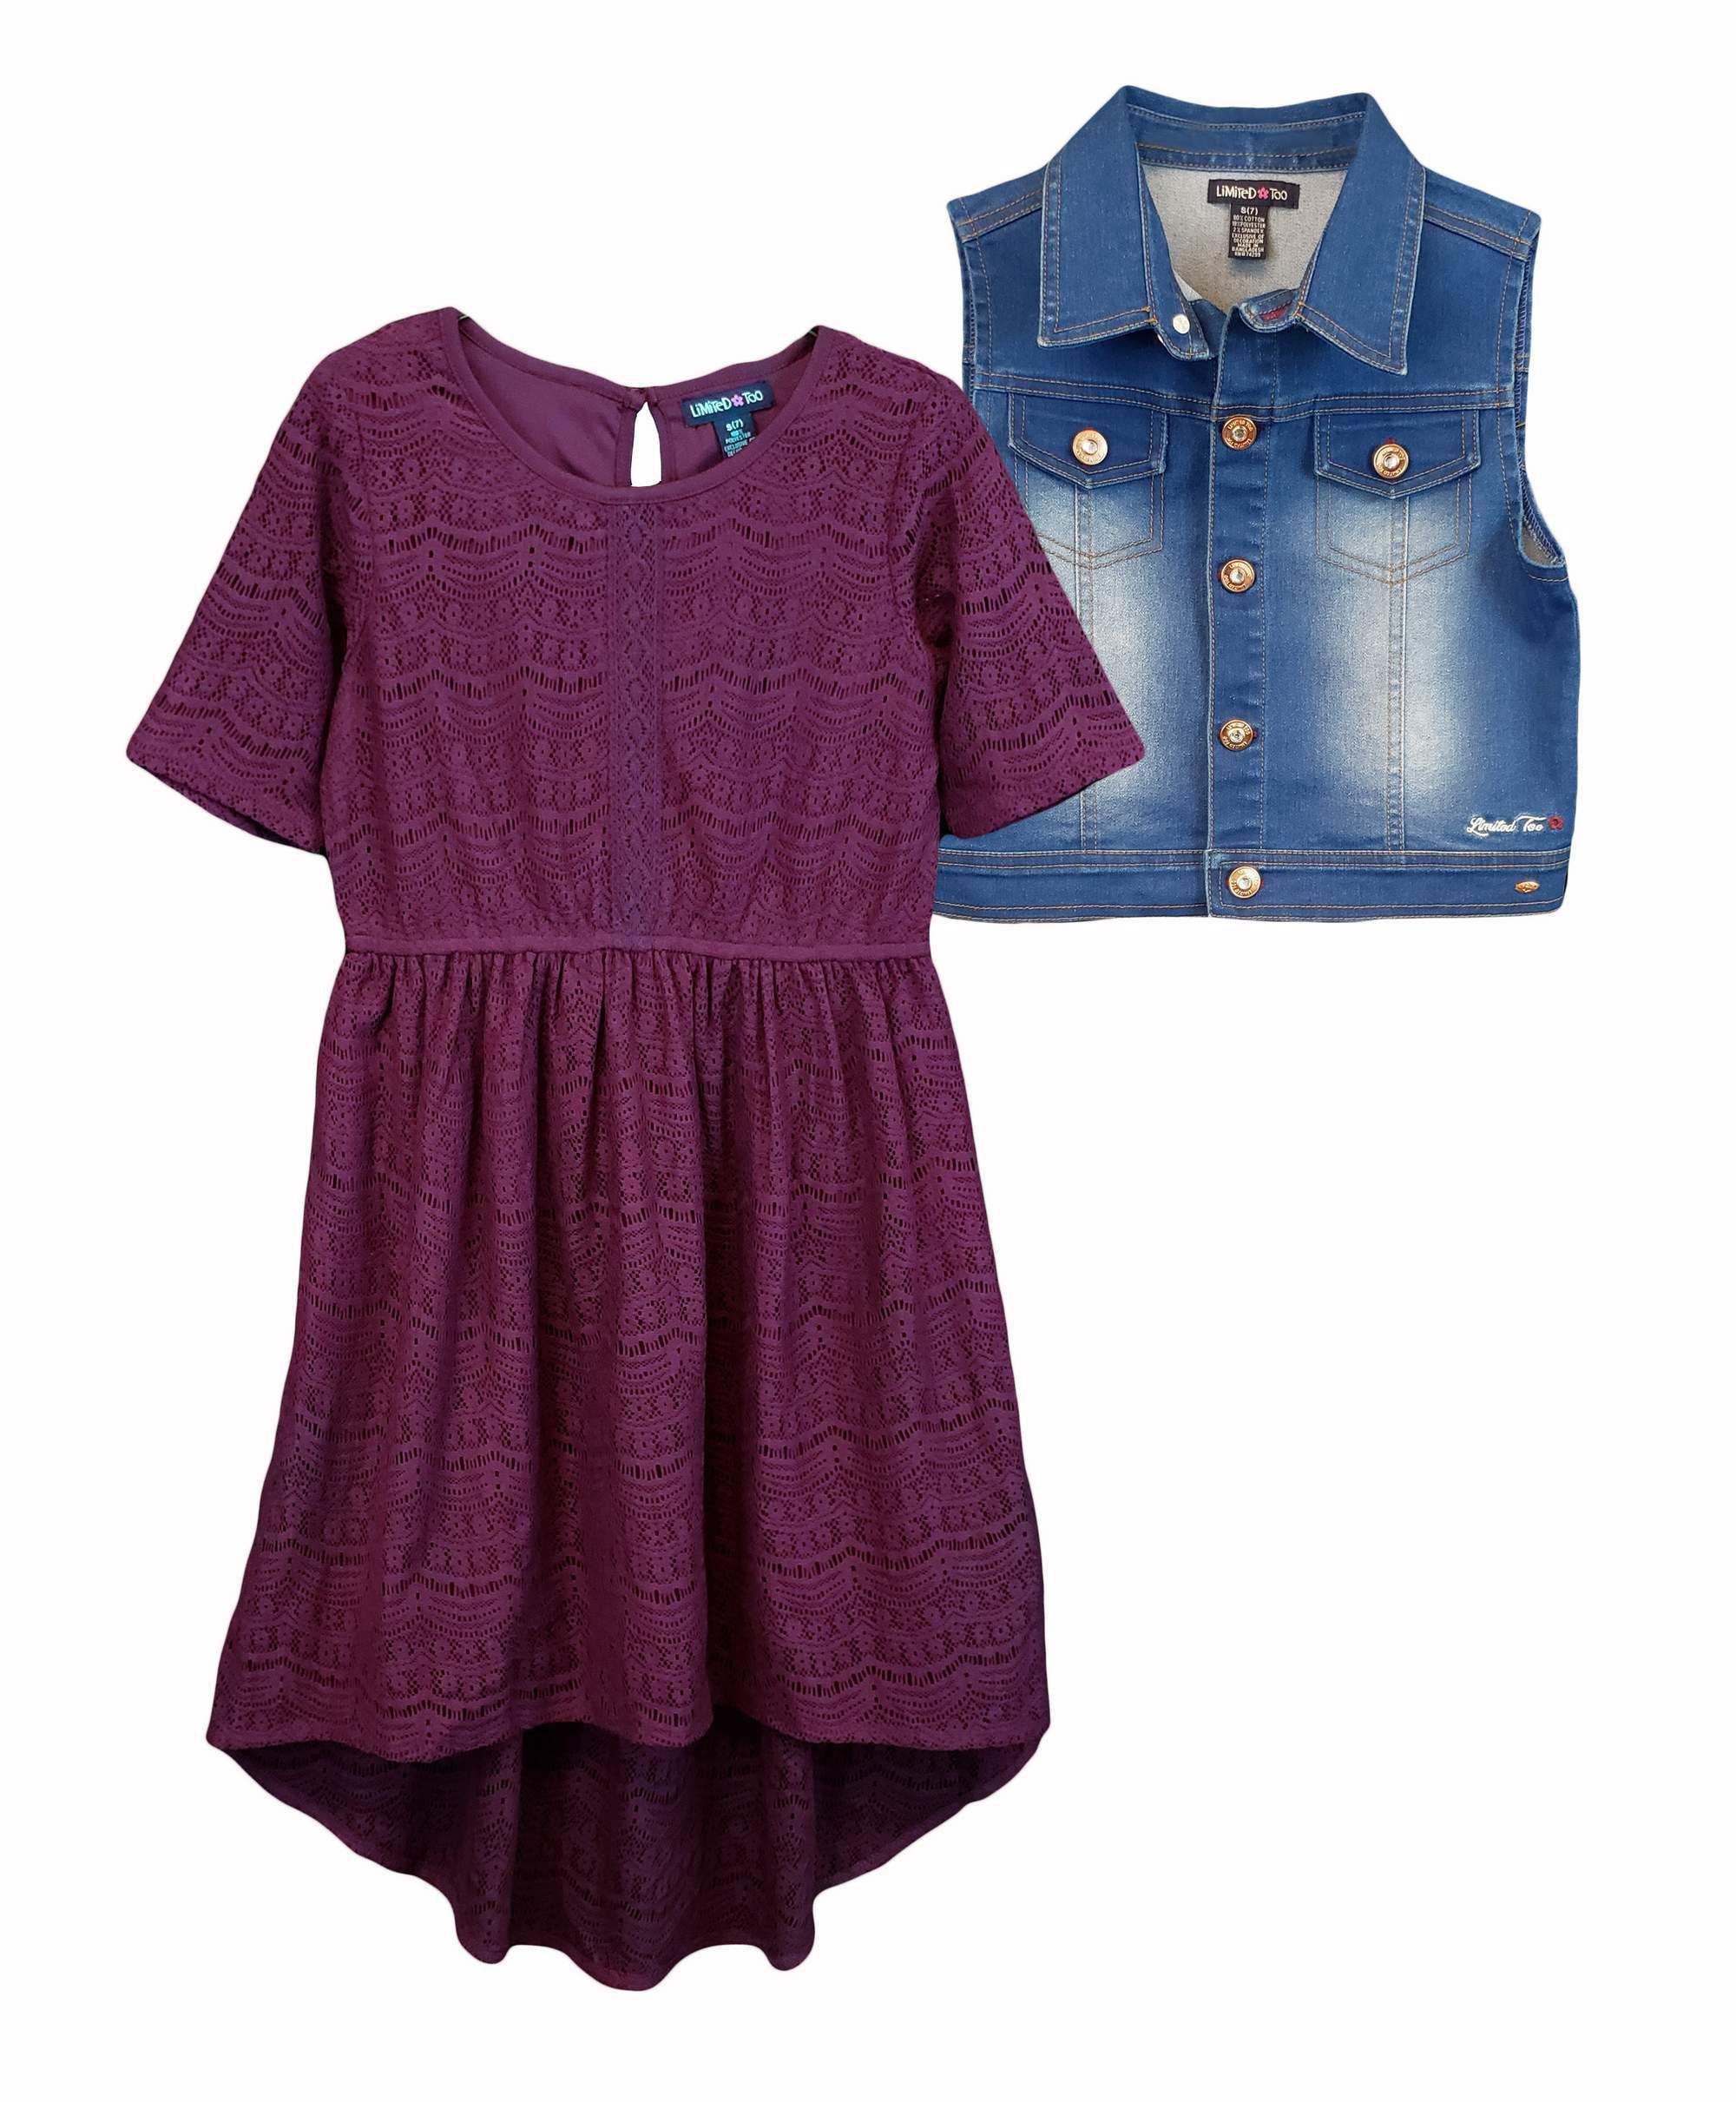 Lace Dress With Denim Vest, 2-Piece Set (Big Girls)